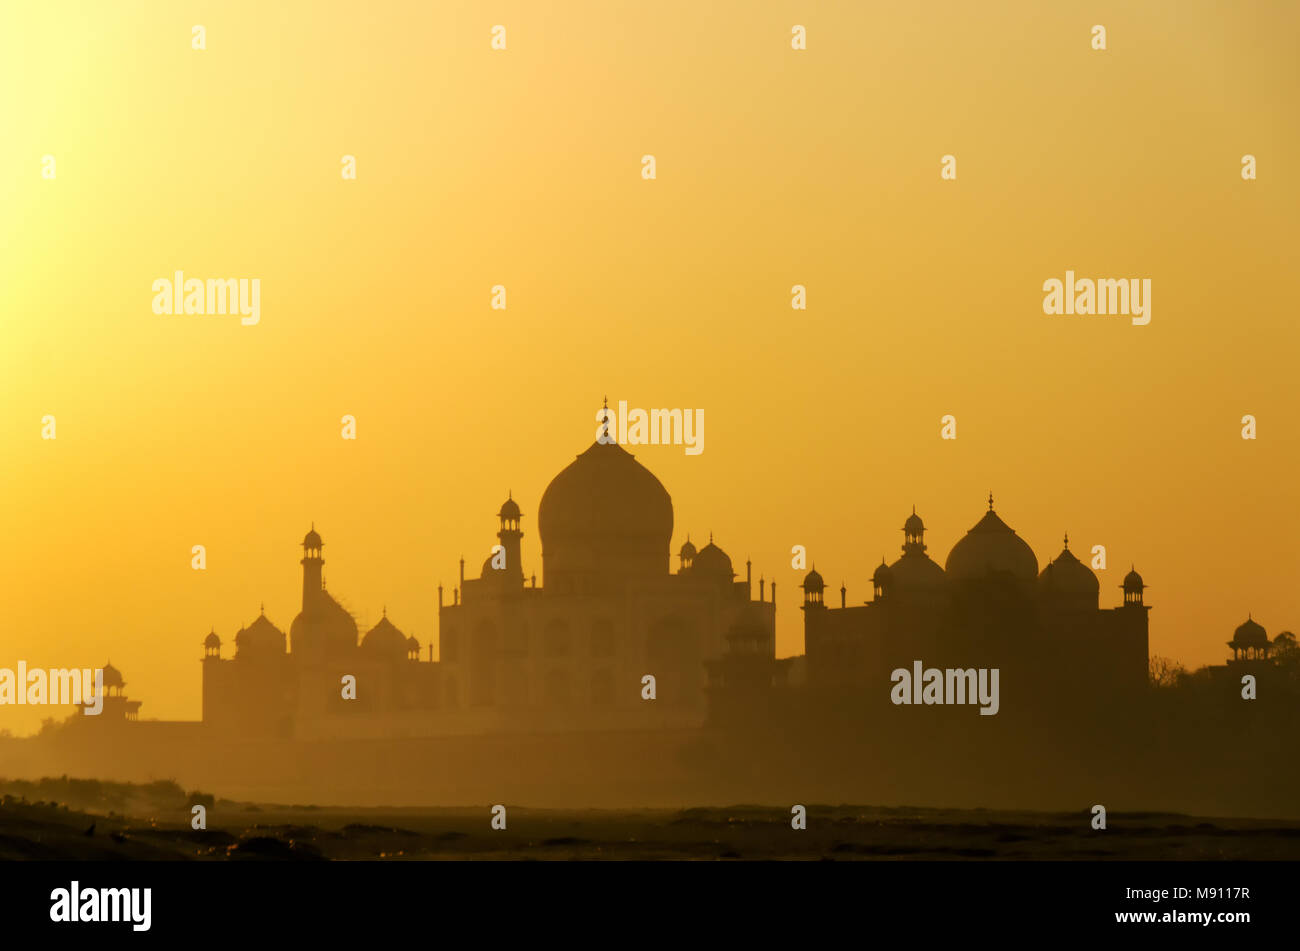 Sunrise view of Taj mahal in Agra, Uttar Pradesh, India. It is one of the most visited landmark in India. - Stock Image